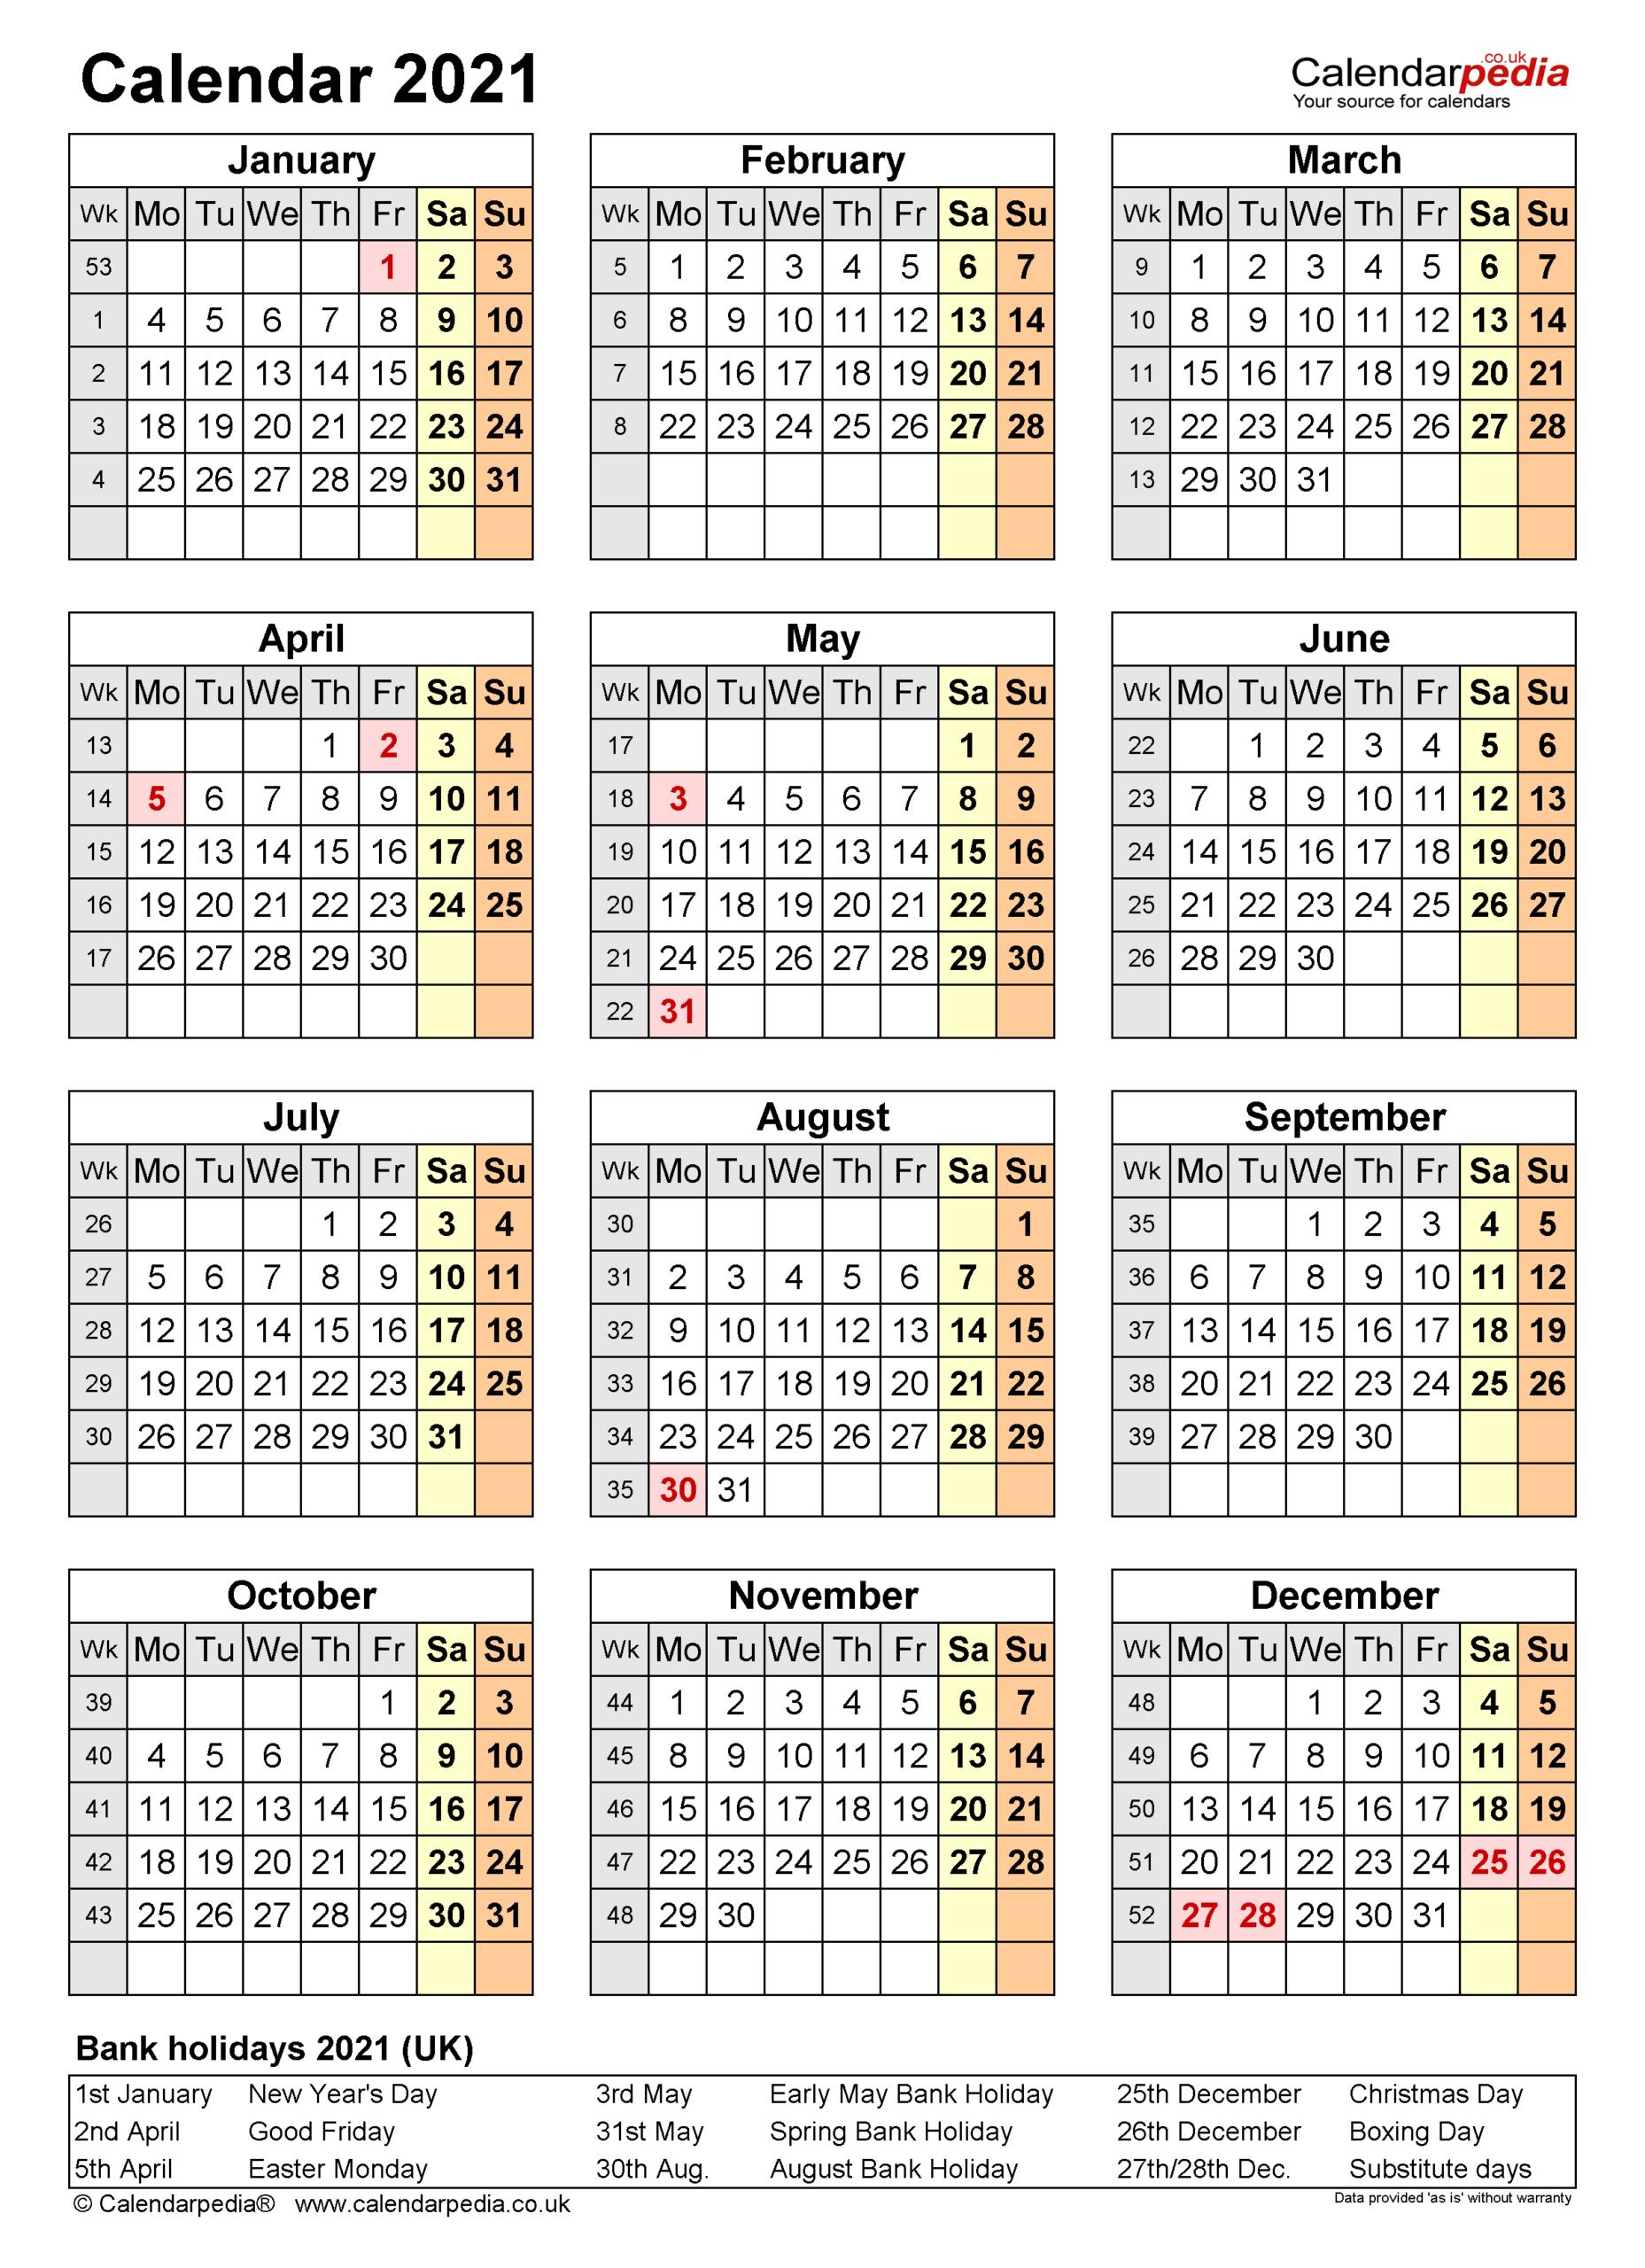 Calendar 2021 (Uk) - Free Printable Pdf Templates